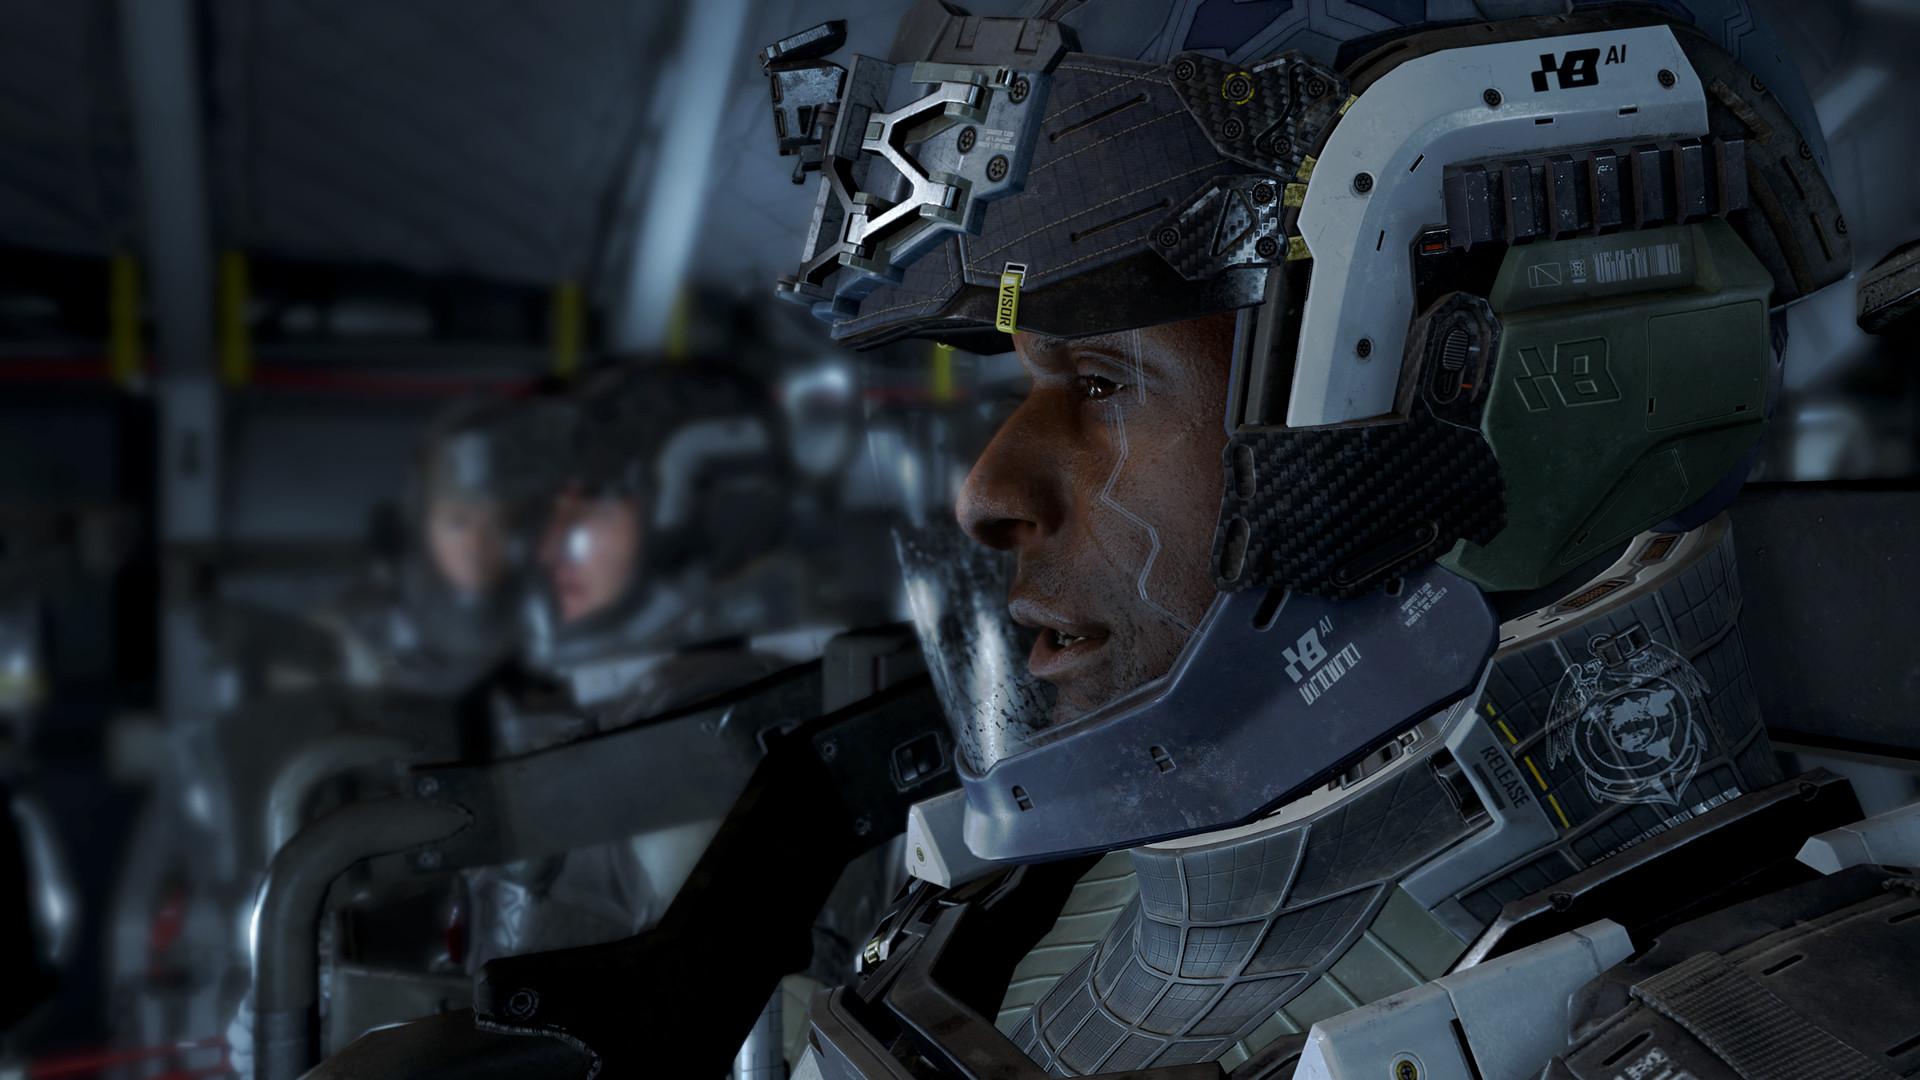 Call Of Duty Infinite Warfare ESPAÑOL Descargar Full + Update v20161118 (RELOADED) + REPACK 11 DVD5 (JPW) 5